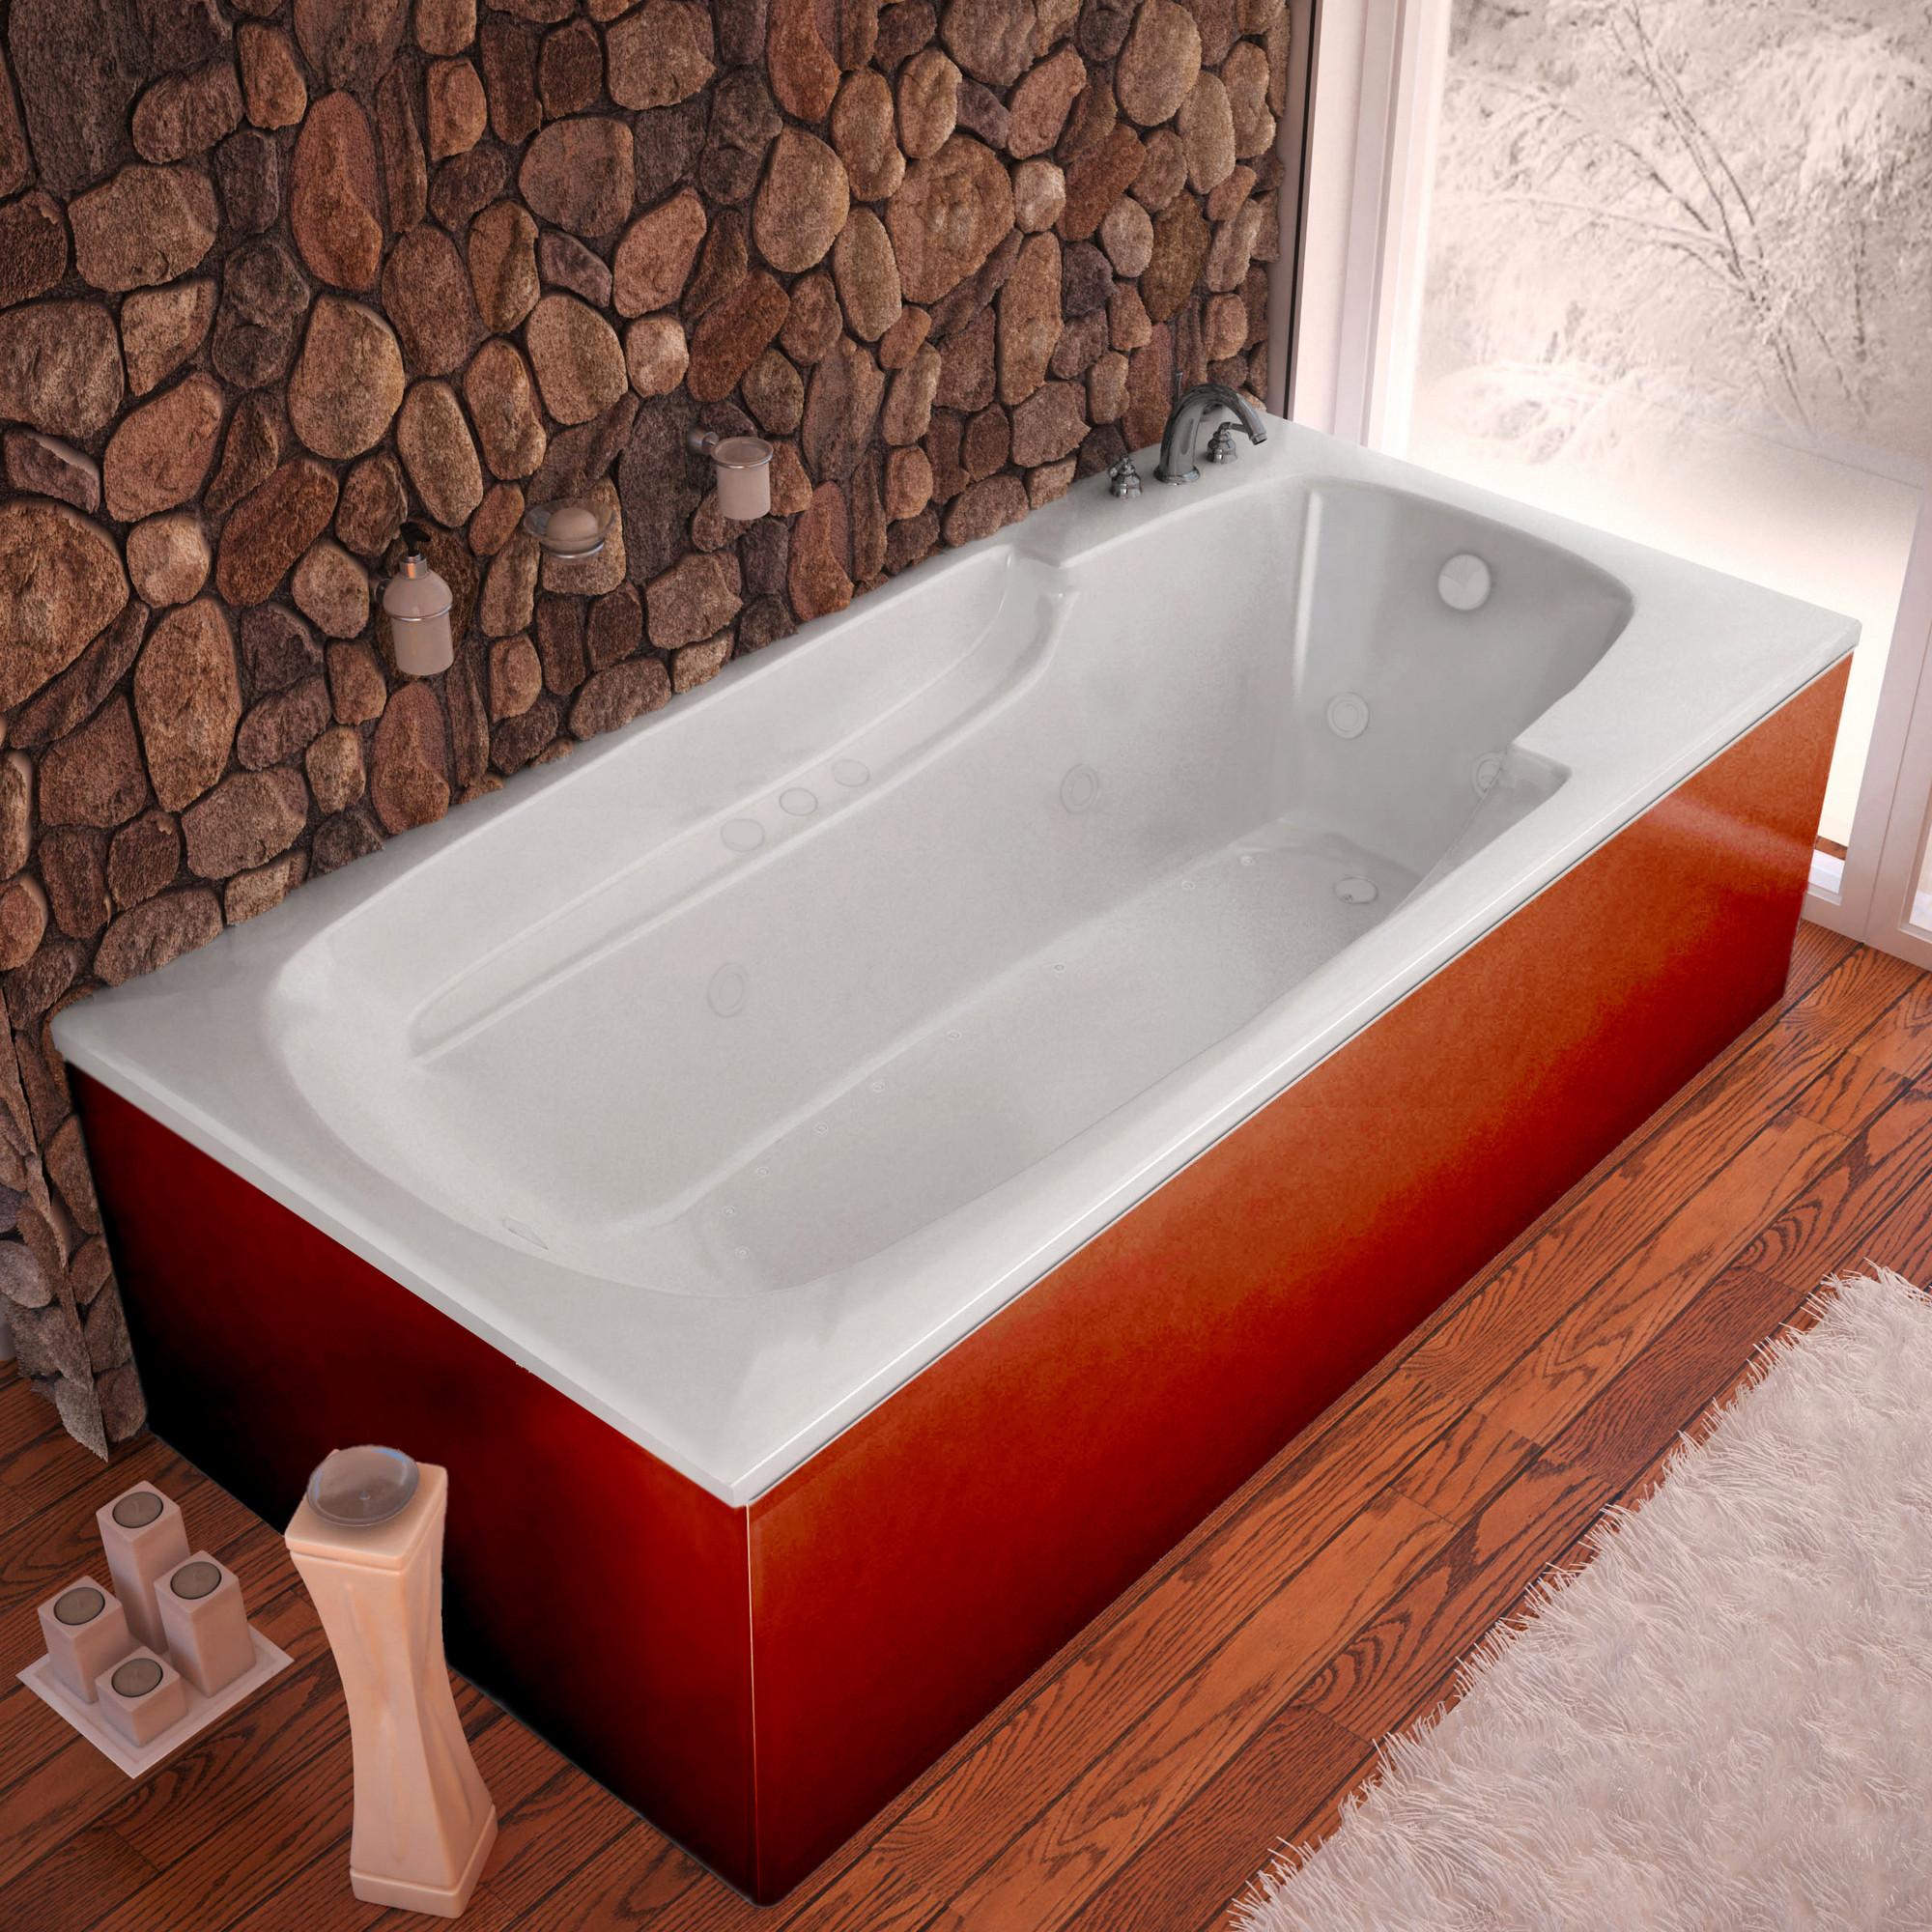 MediTub 4272EDL Atlantis Eros Acrylic Air & Whirlpool Tub With Left Drain